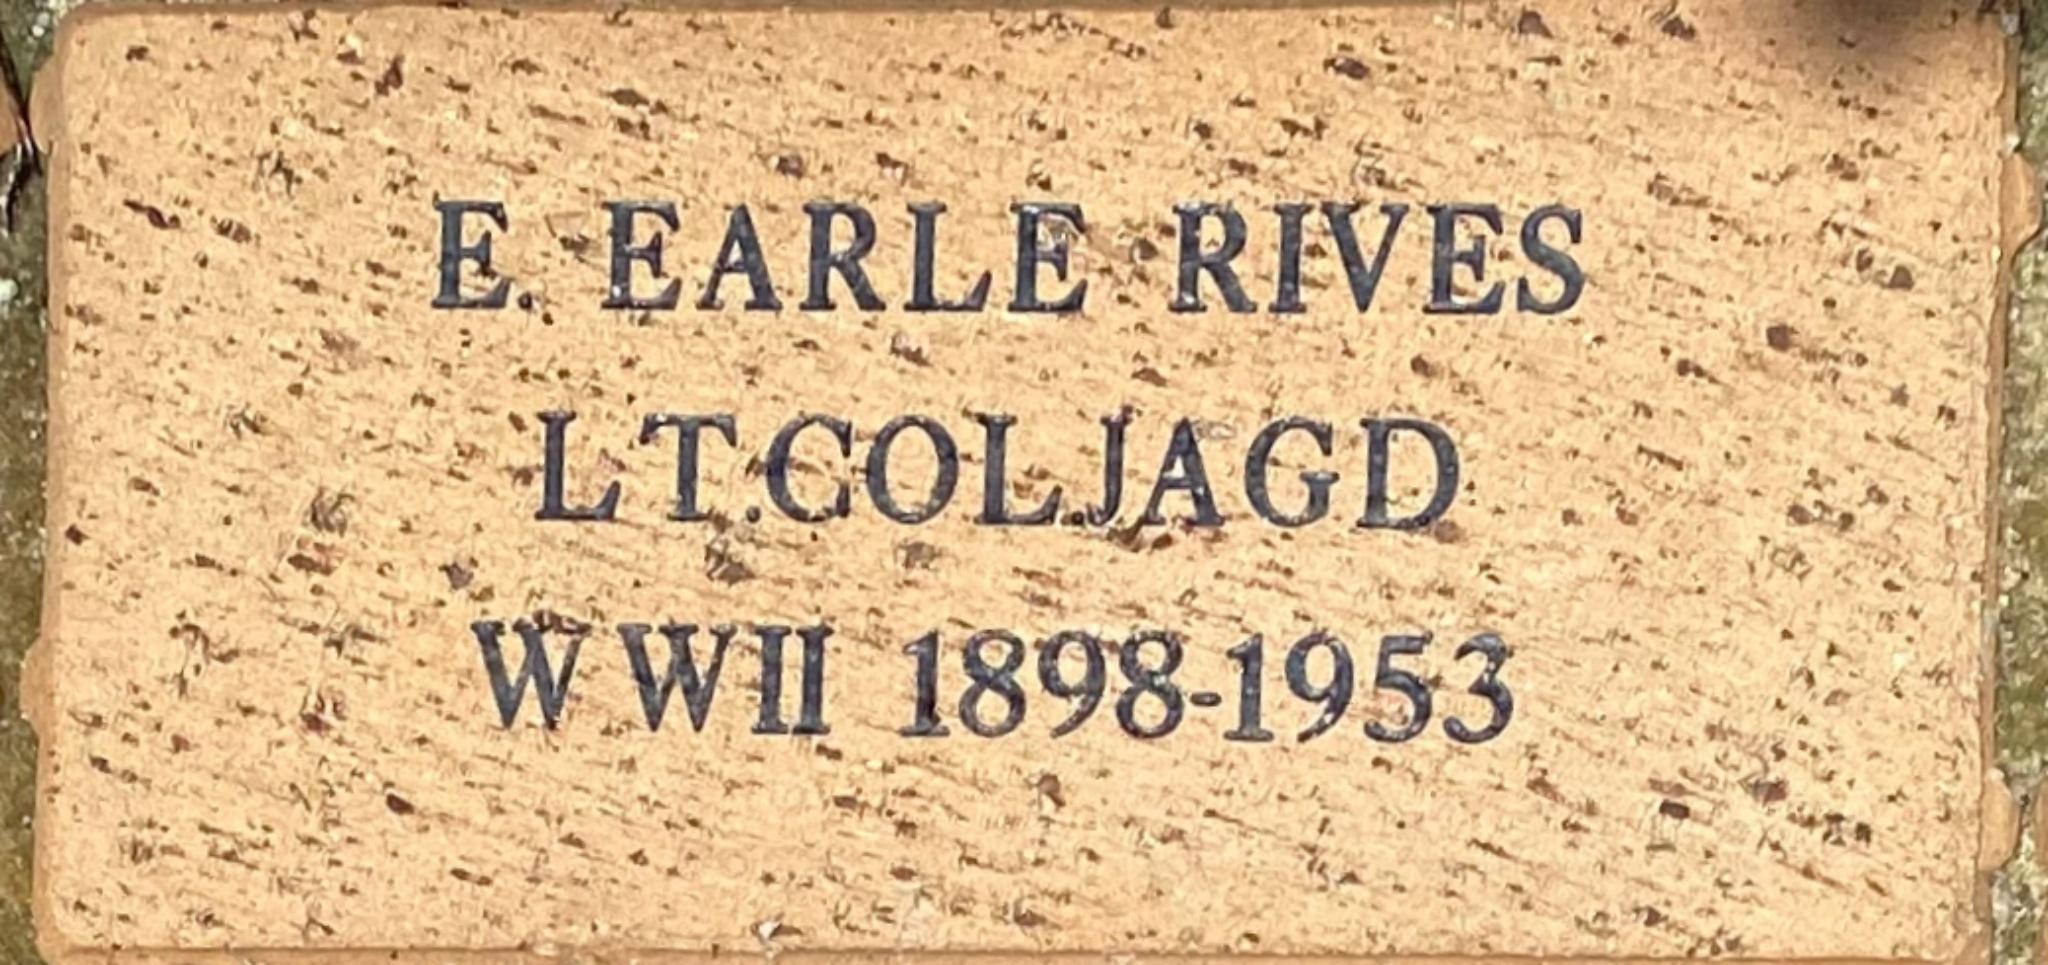 E. EARLE RIVES LT. COL. JAGD  WWII 1898-1953